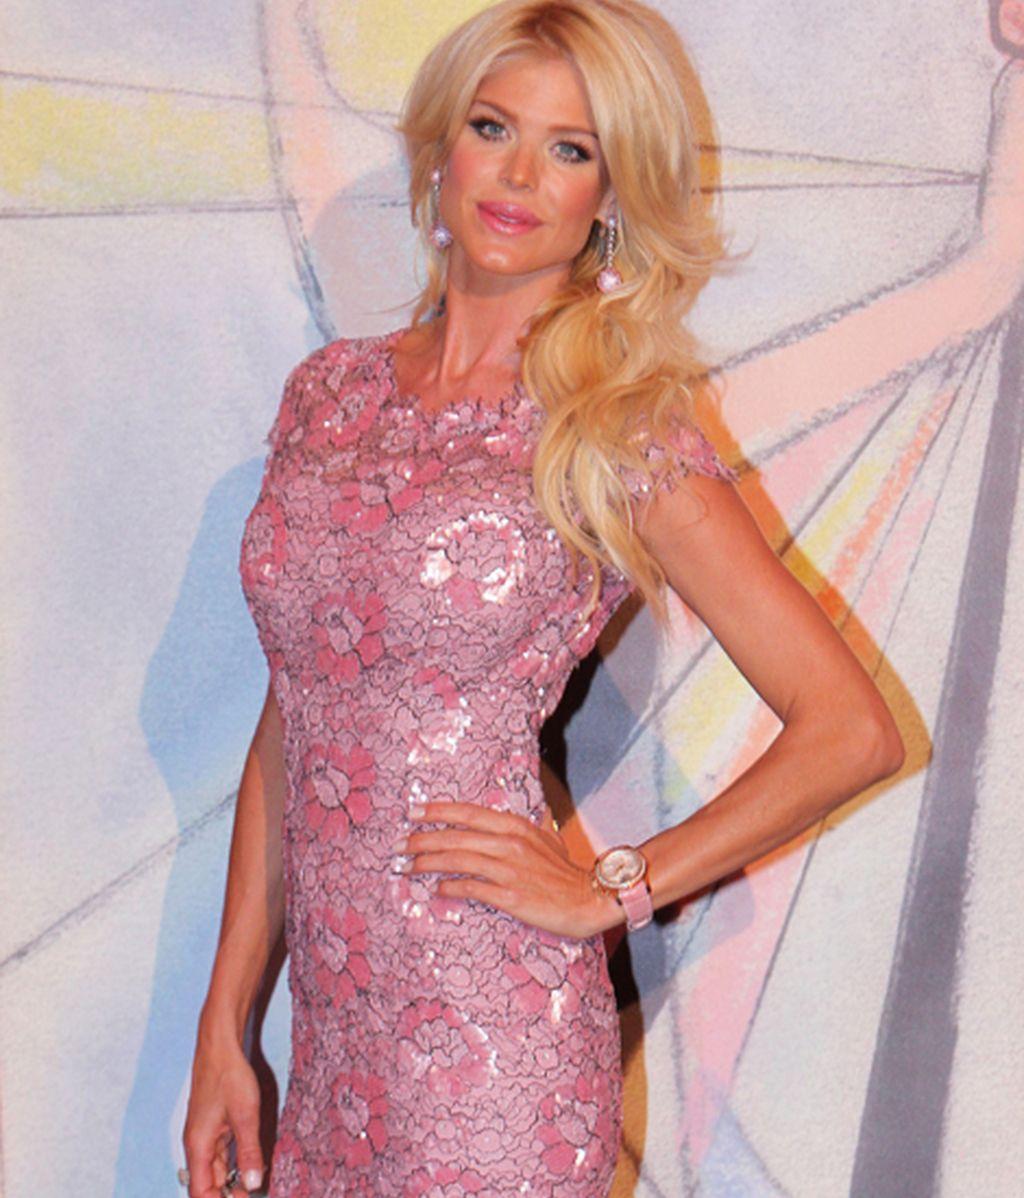 La modelo y cantante Victoria Silvsted